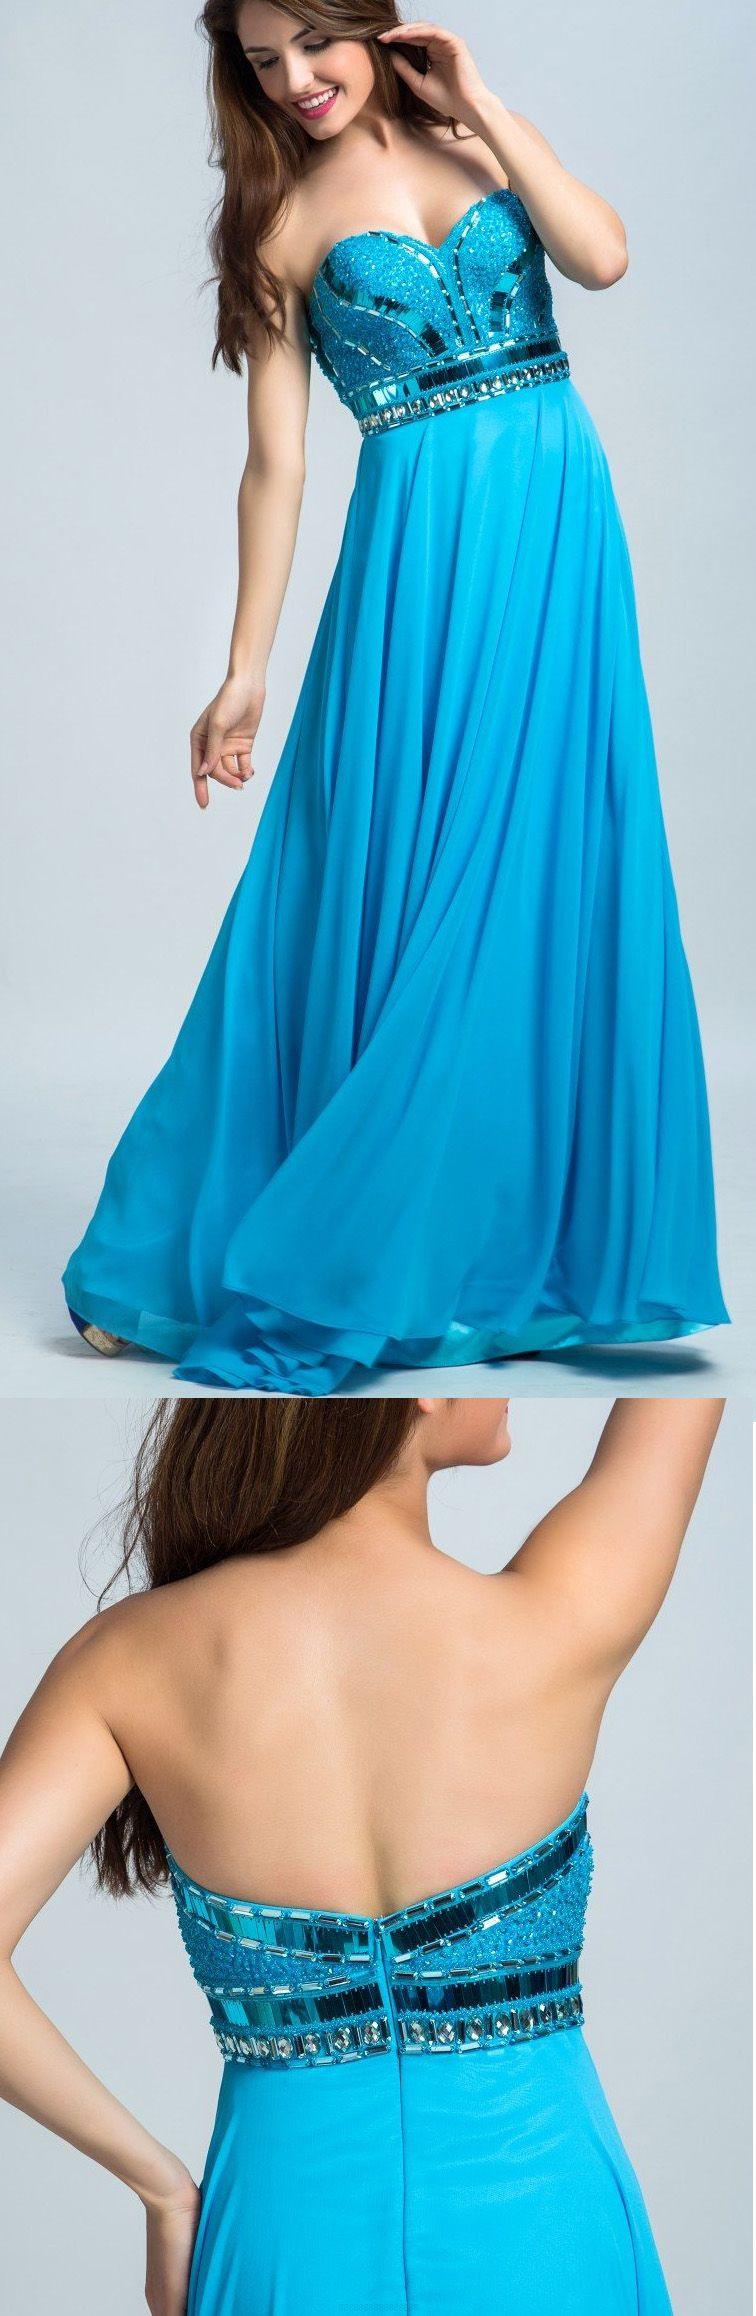 Long prom dresses blue prom dresses prom dresses